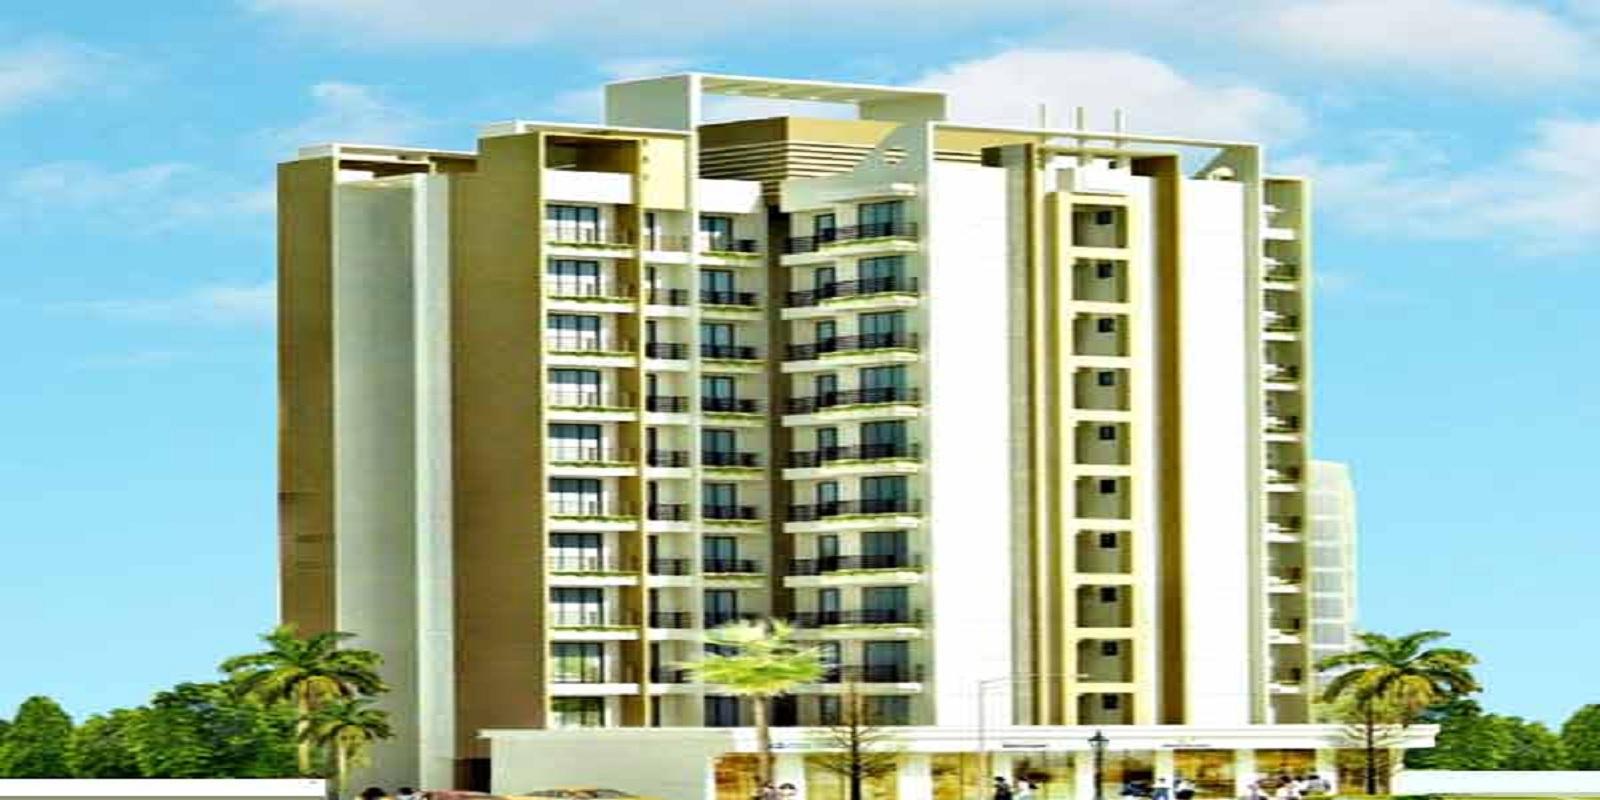 shri kambeshwar heights project large image3